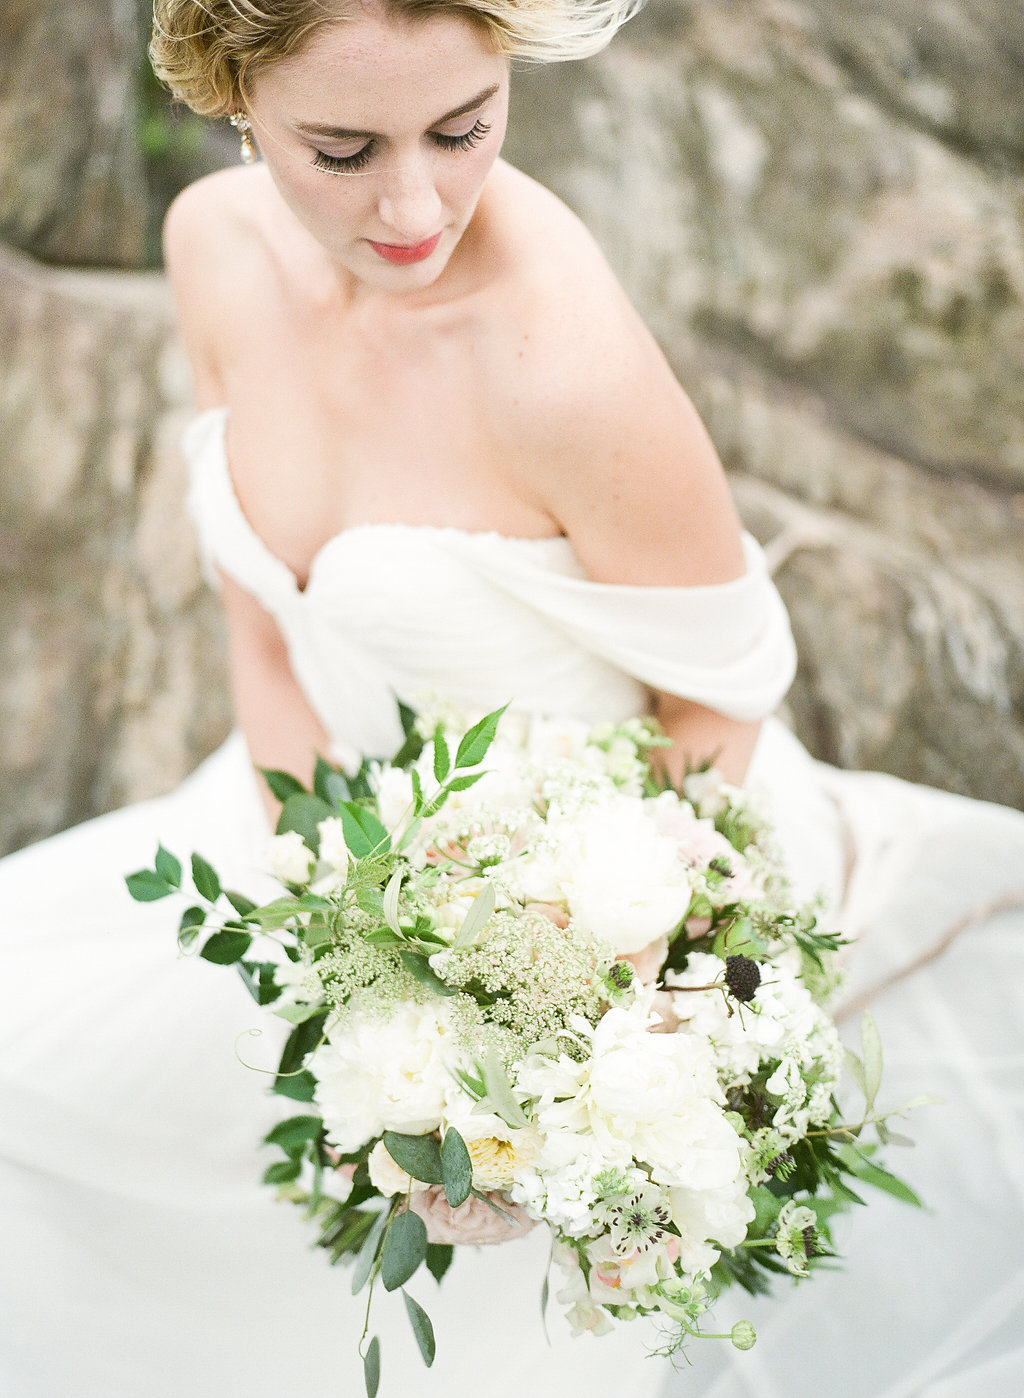 josie-photographs-urban-petals-mountain-wedding-north-carolina-mountain-wedding-ivory-and-beau-bridal-boutique-savannah-wedding-dresses-savannah-bridal-boutique-savannah-wedding-gowns-sarah-seven-lafayette-sarah-seven-wedding-dress-boho-bride-14.jpg